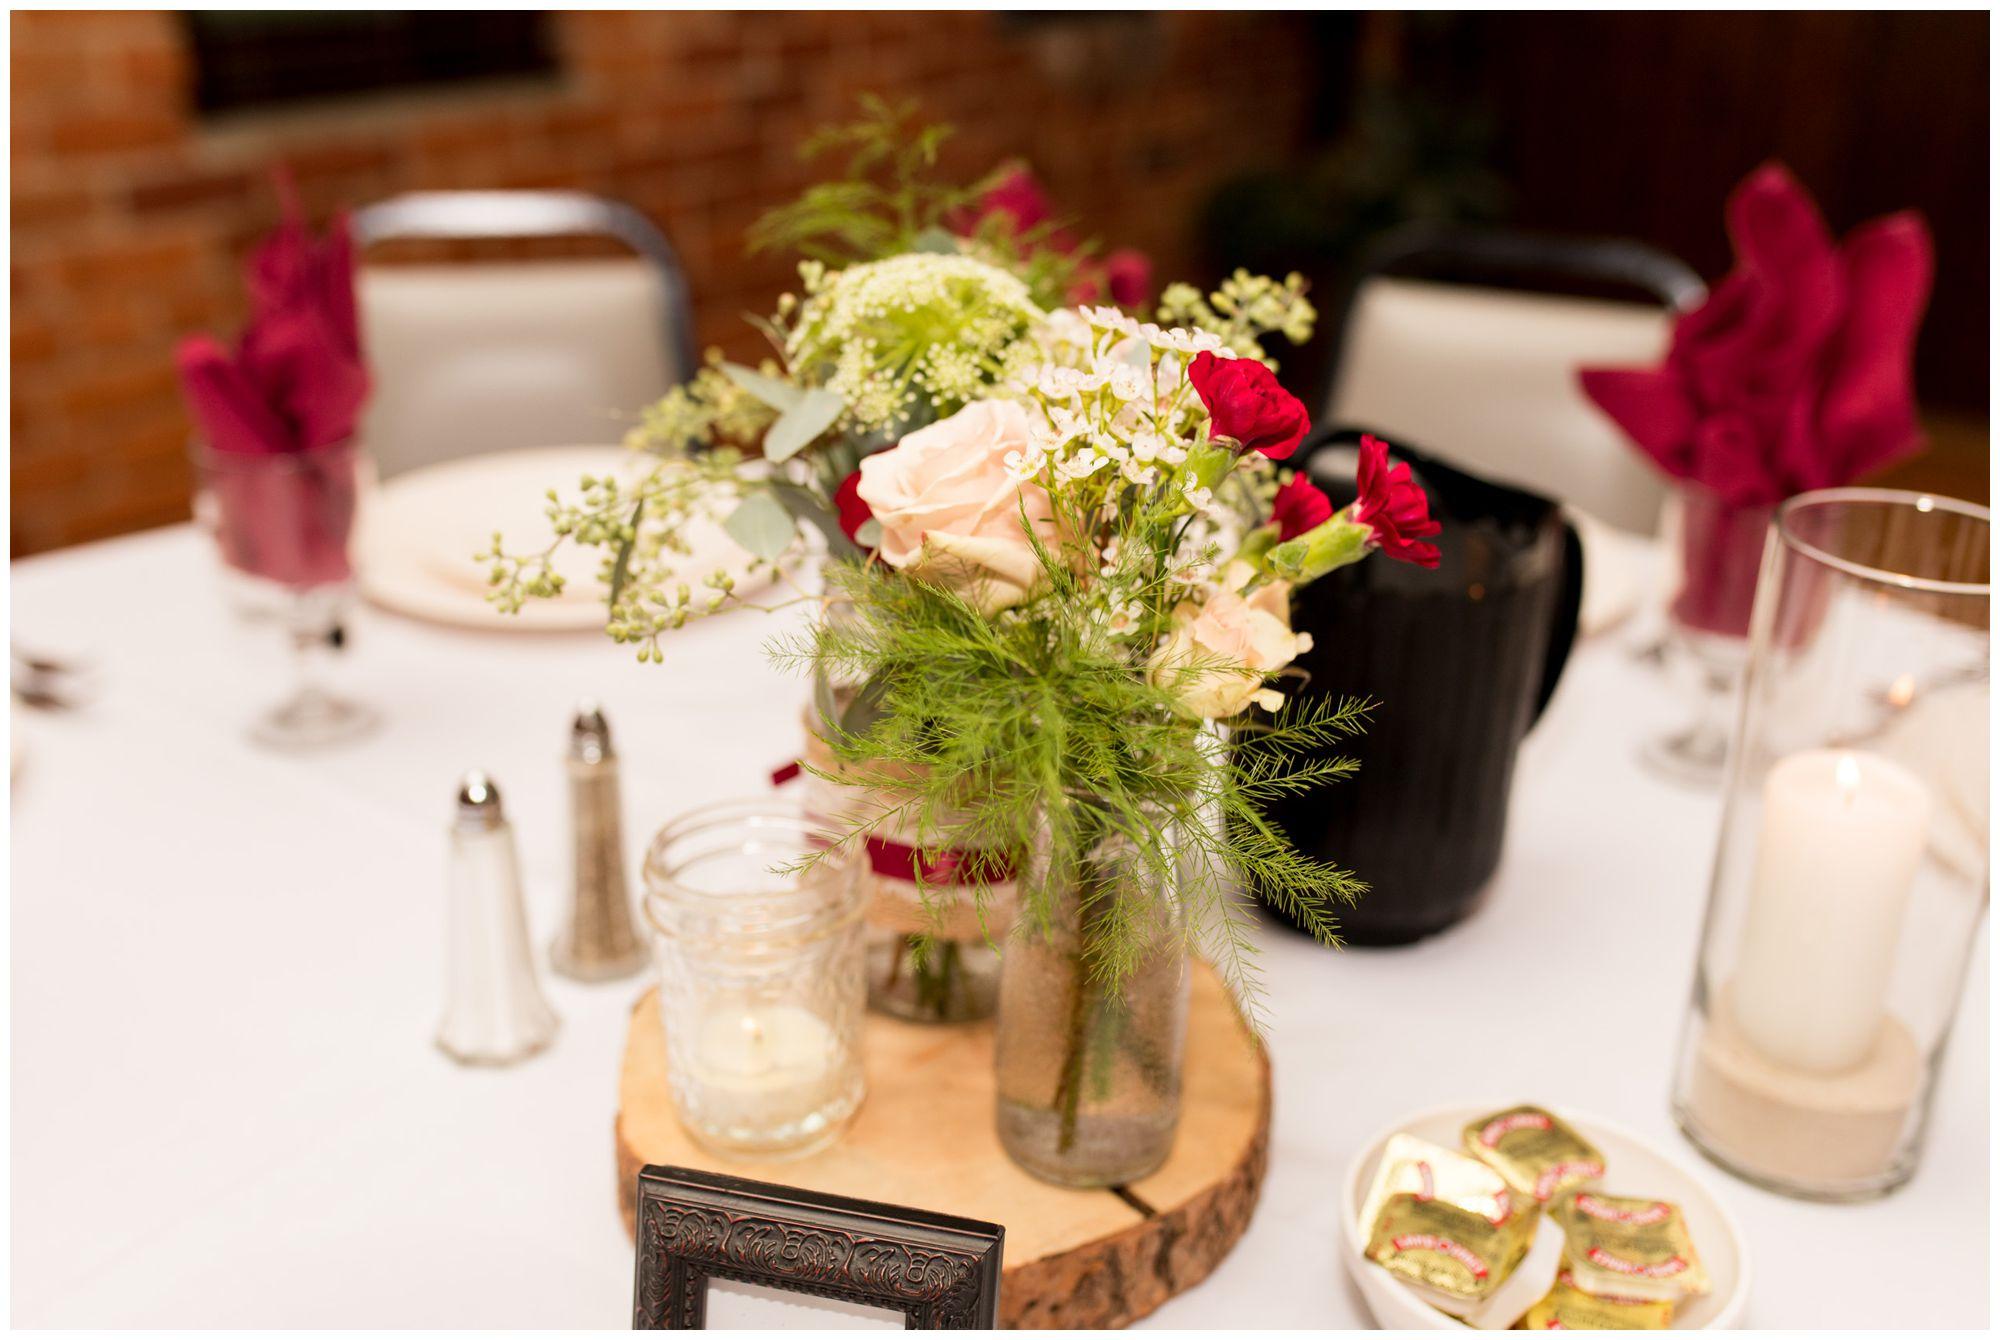 wedding reception table decor at Goeglein Homestead in Fort Wayne